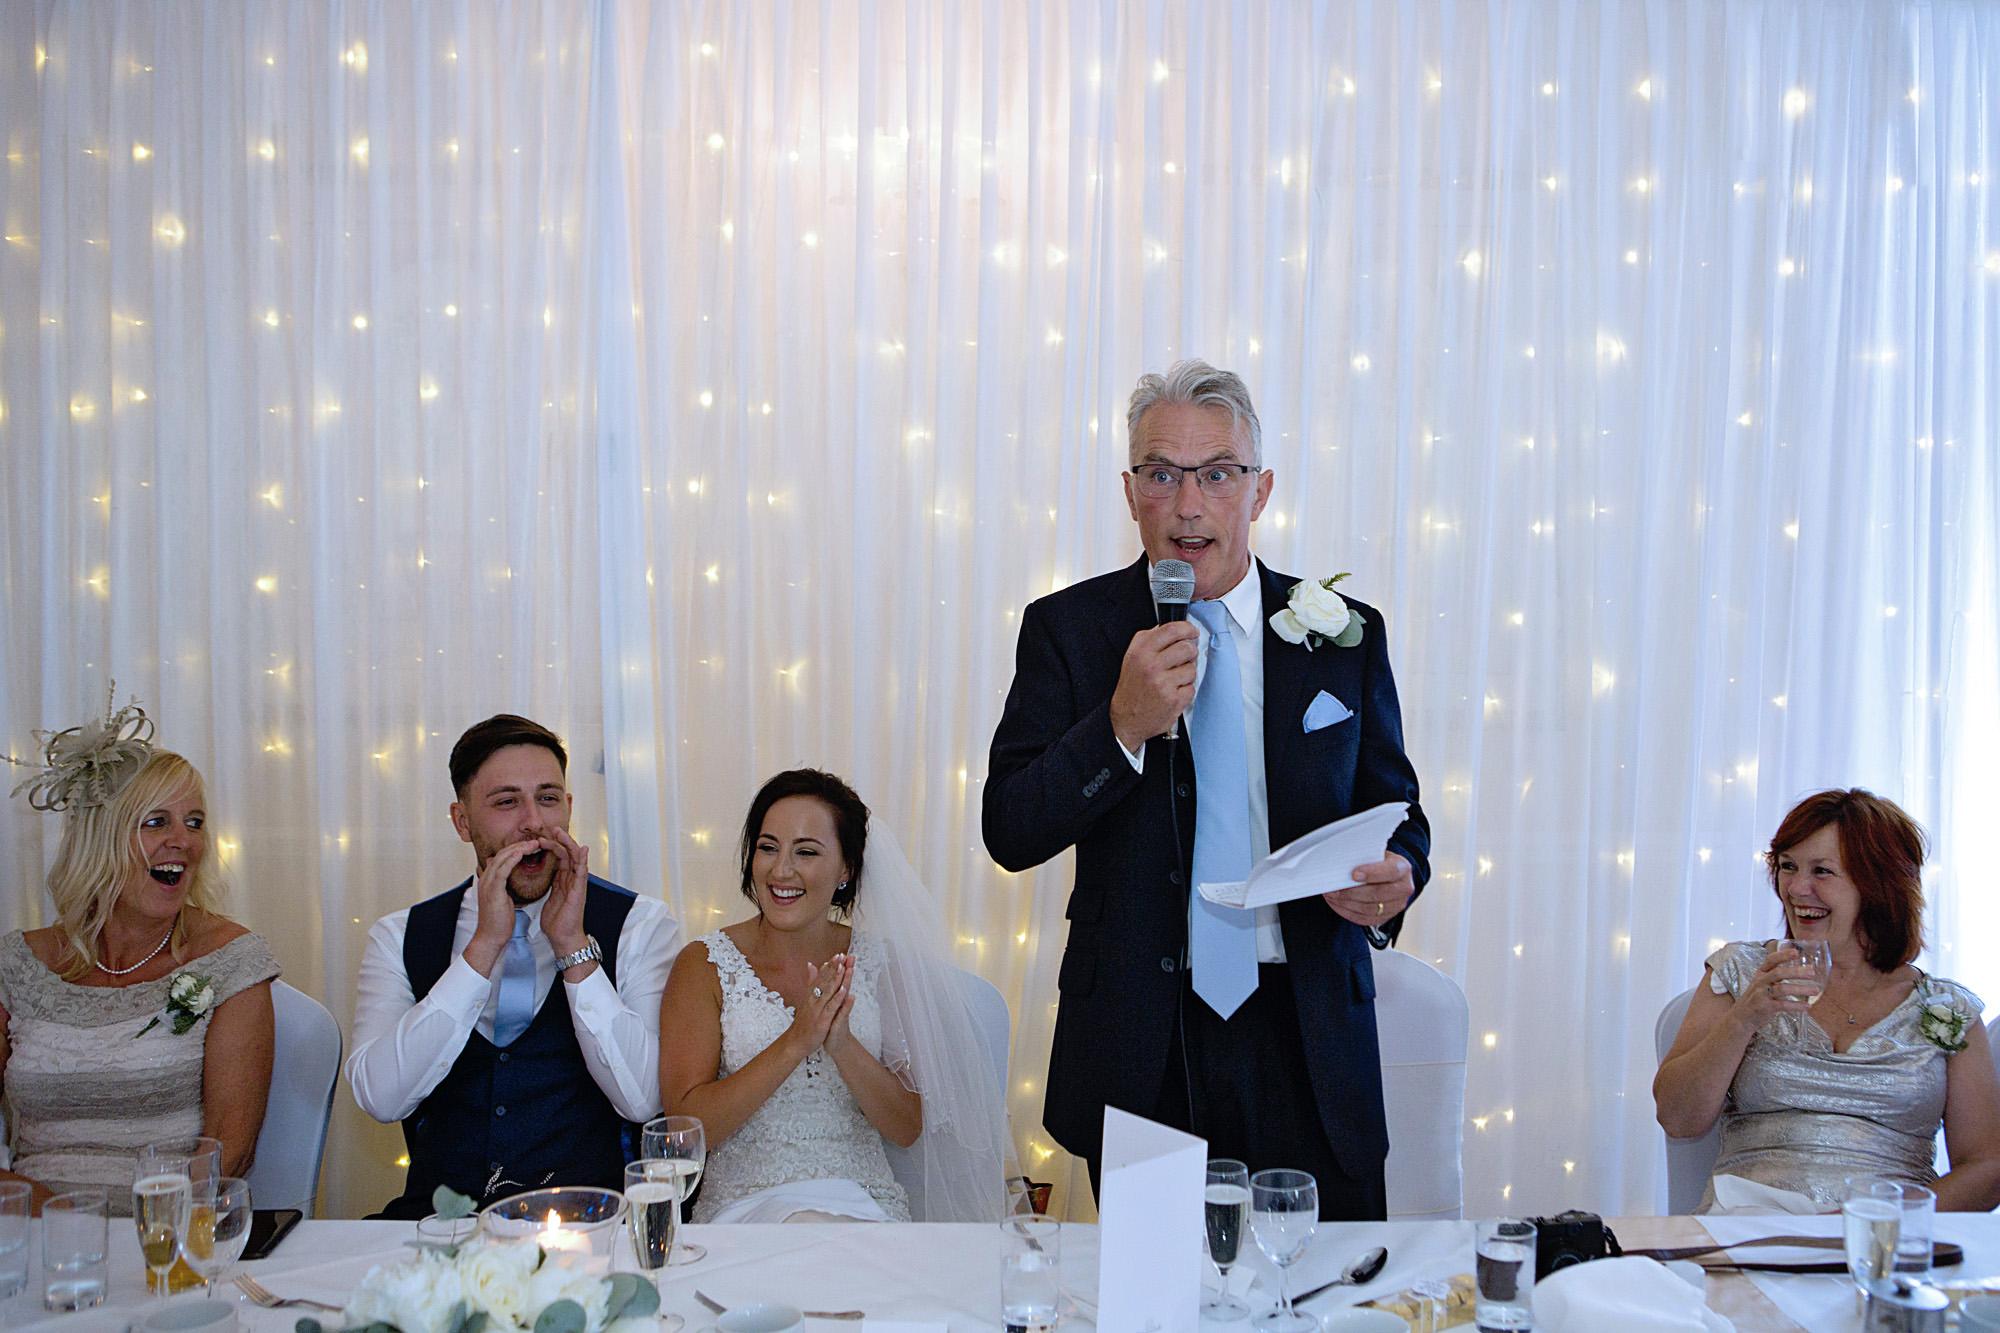 wedding-barnsdale-hall (29).jpg